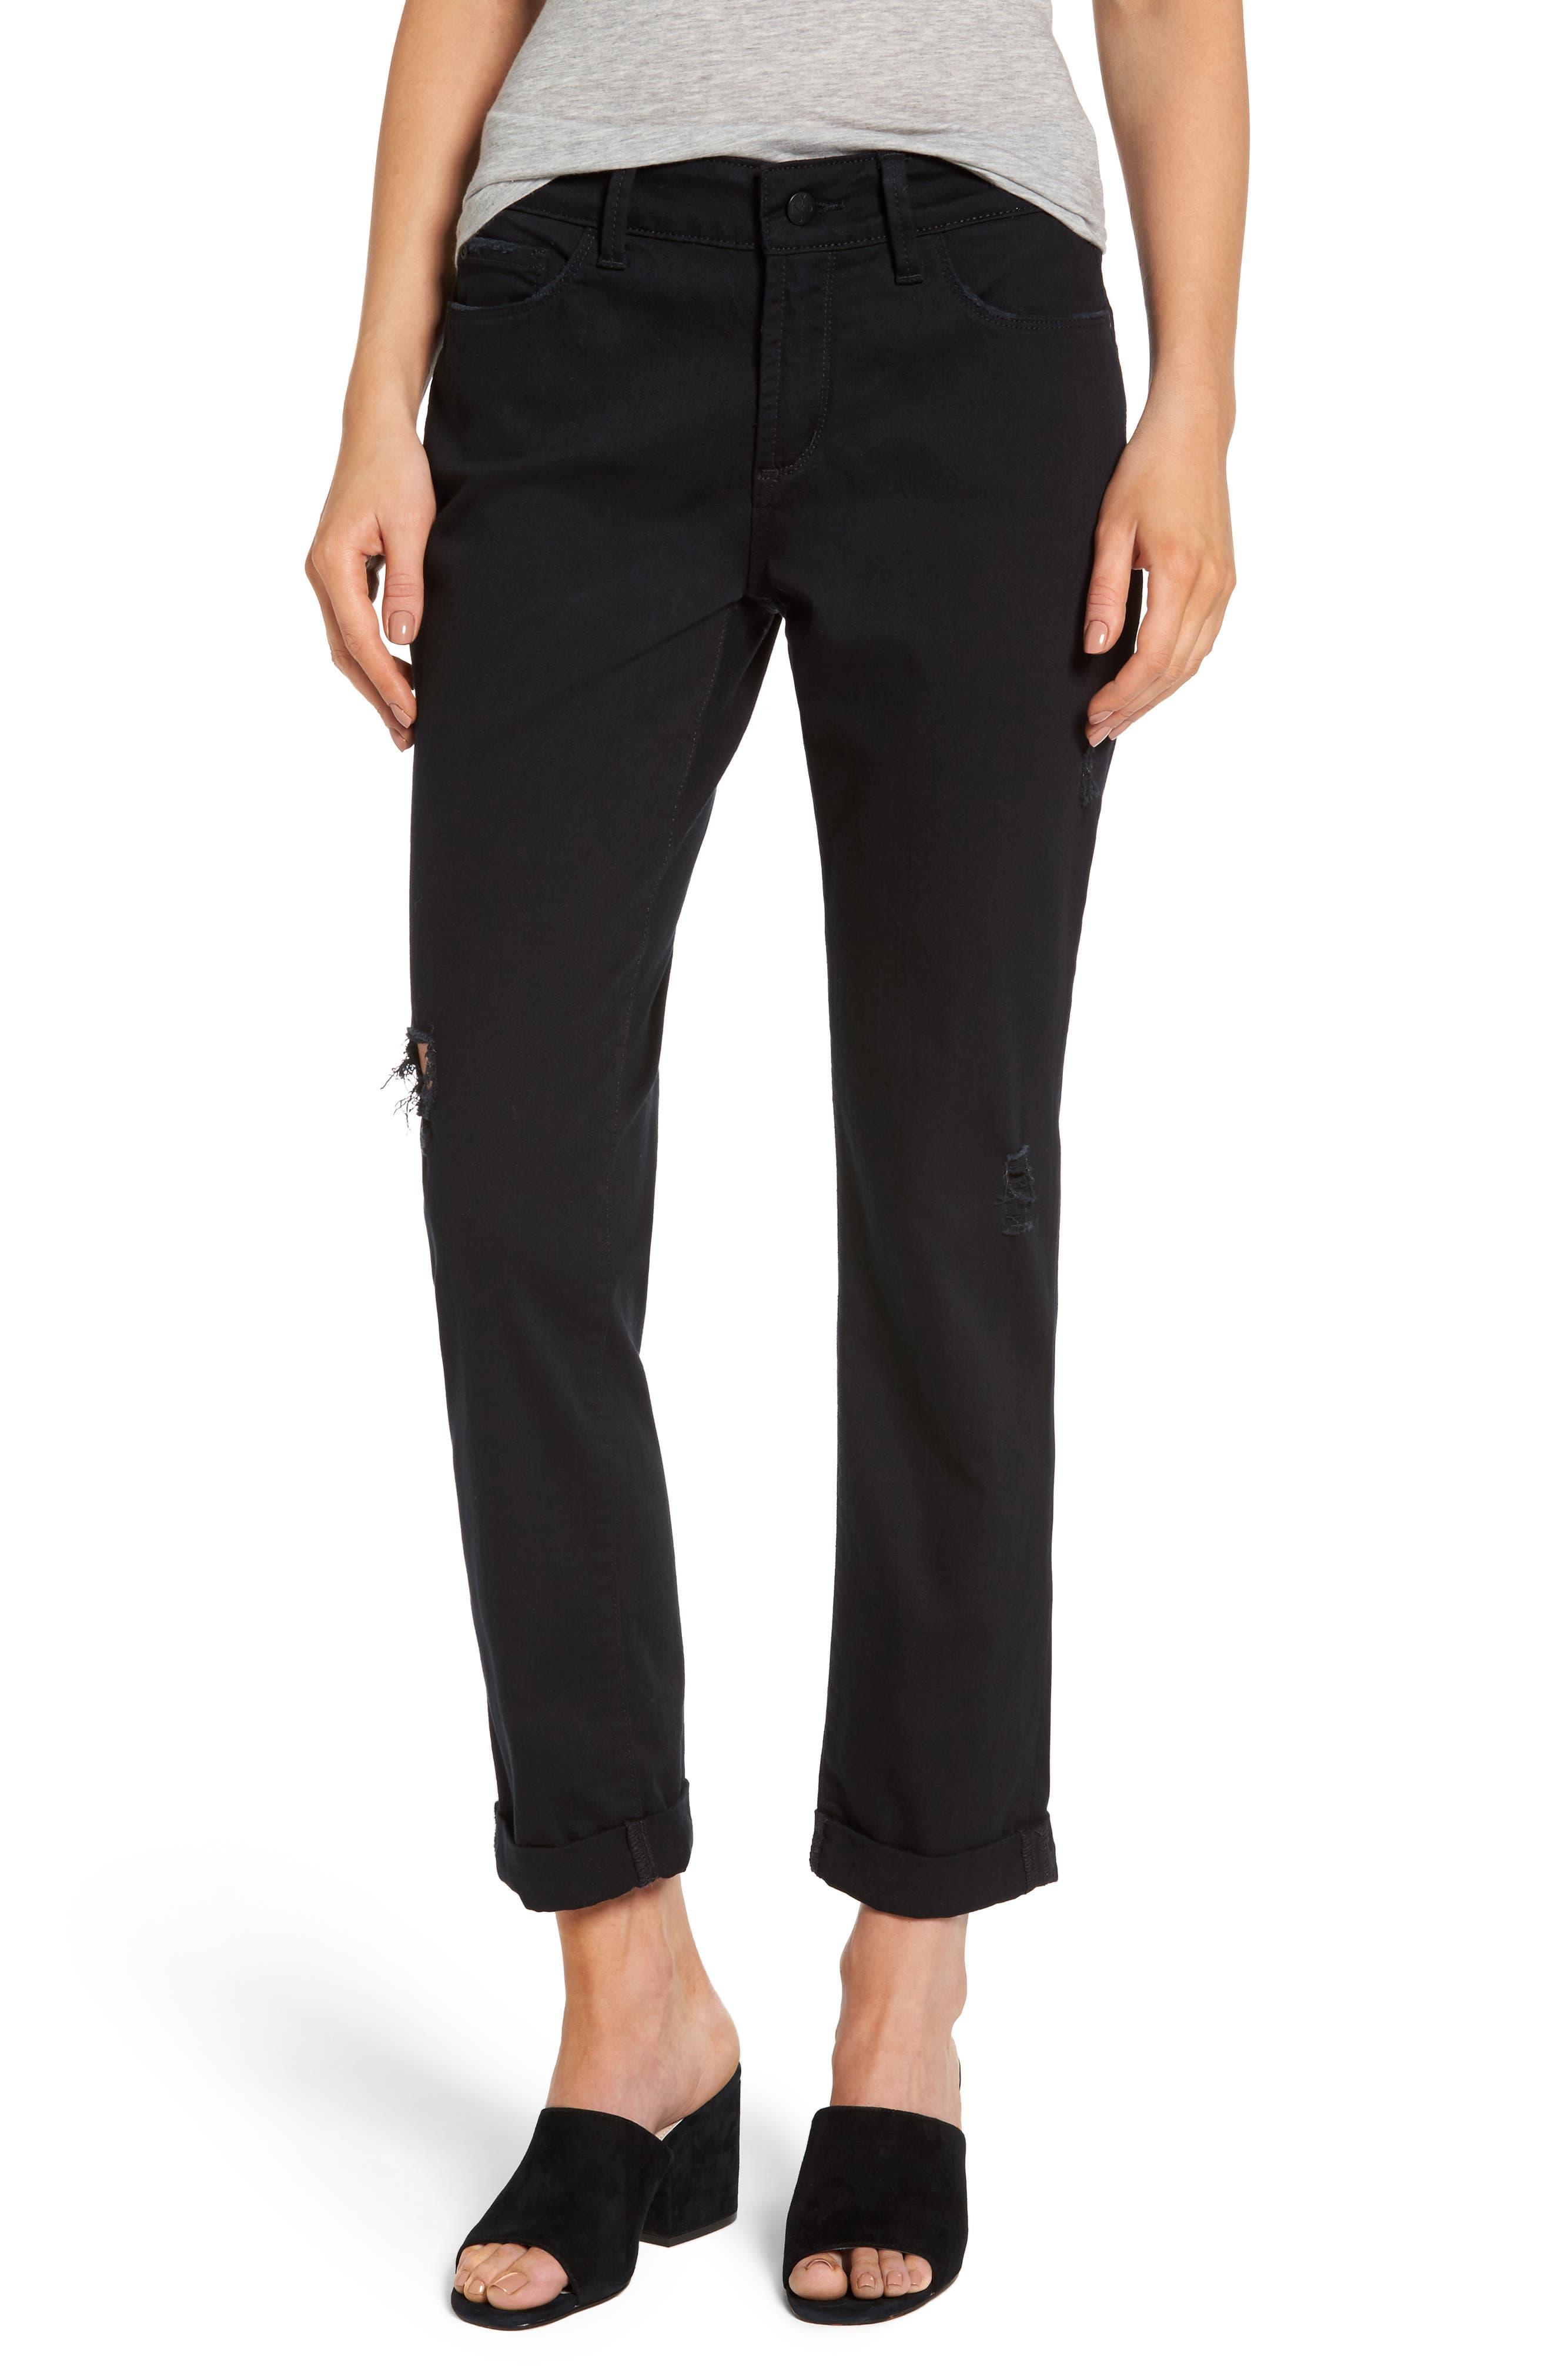 Jessica Destructed Stretch Boyfriend Jeans,                         Main,                         color, 001